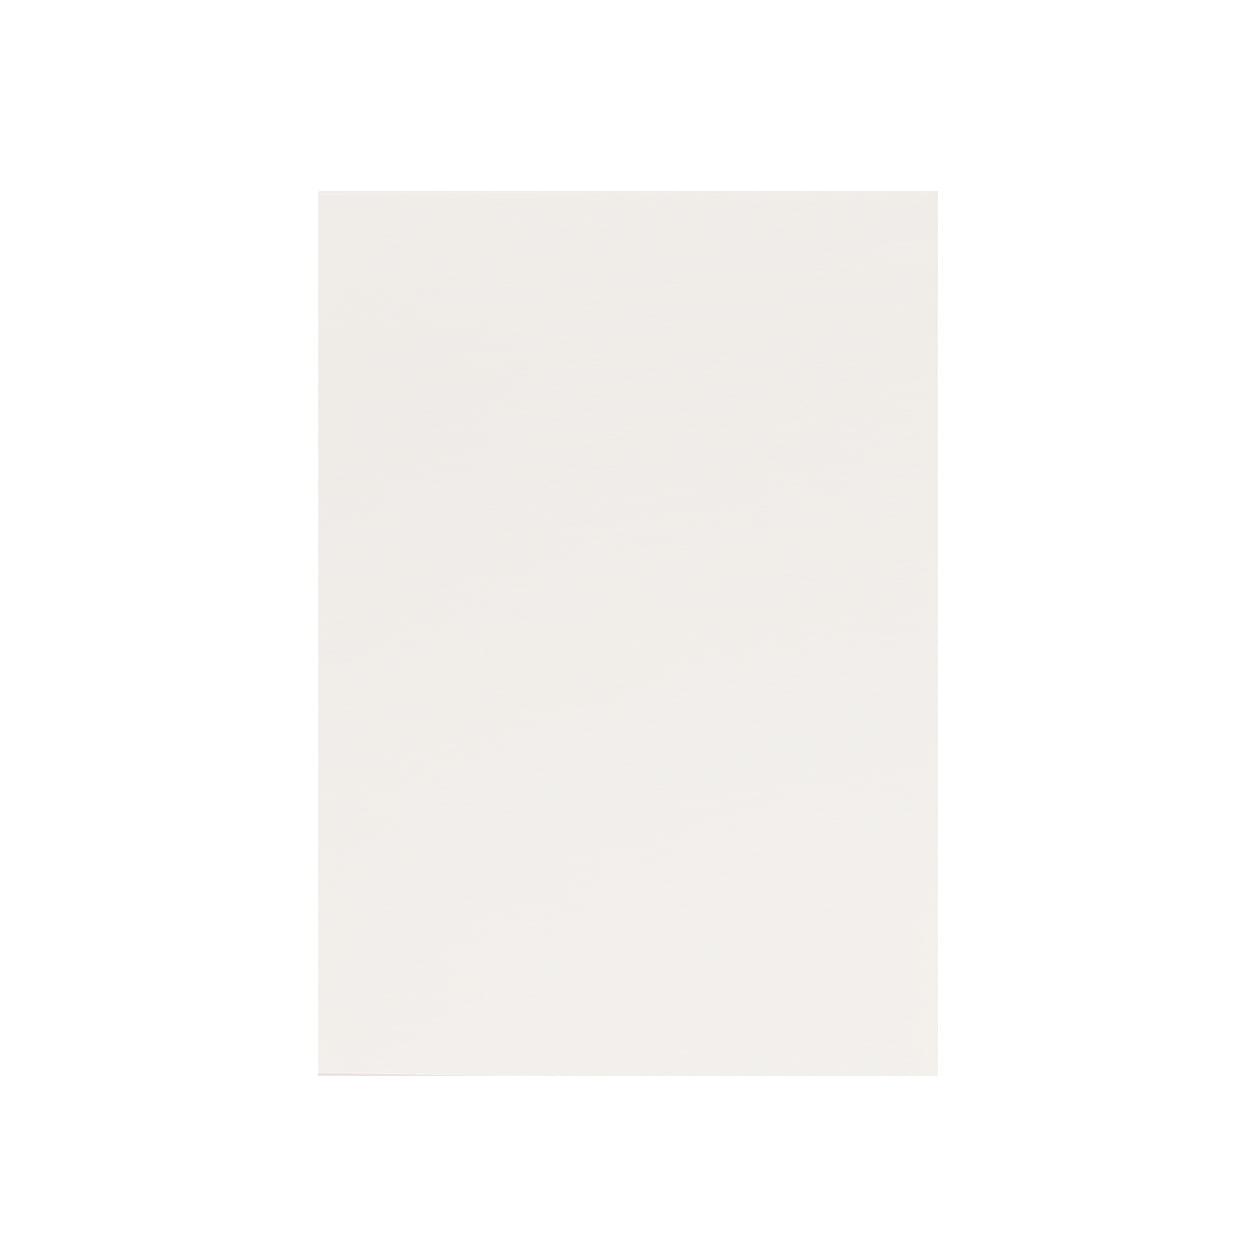 A6シール HAGURUMA Basic プレインホワイト